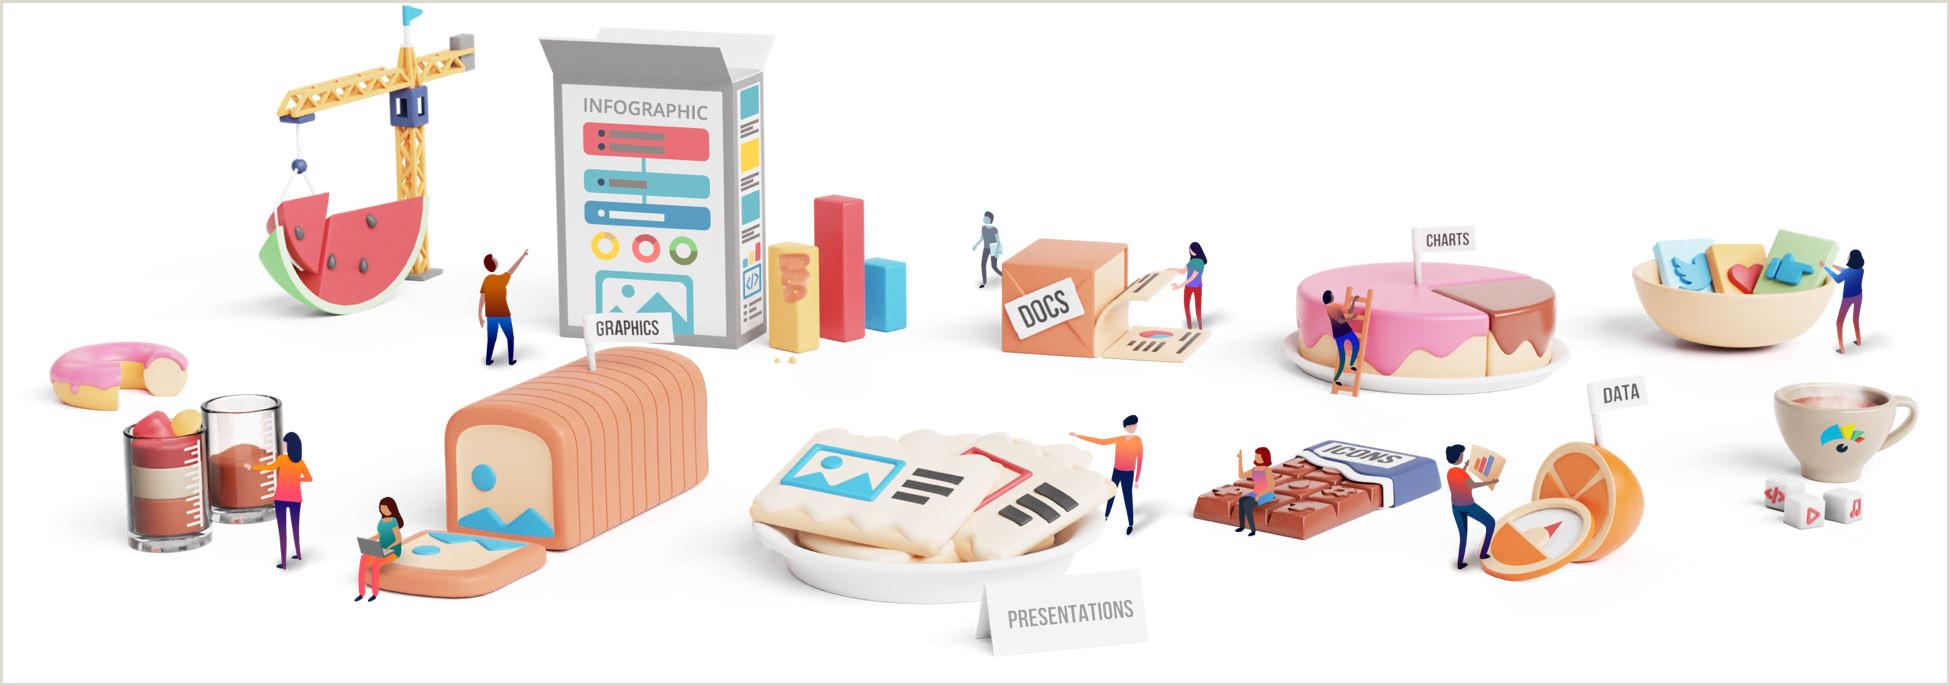 Designing A Pop Up Banner Free Infographic Software And Presentation Maker Make